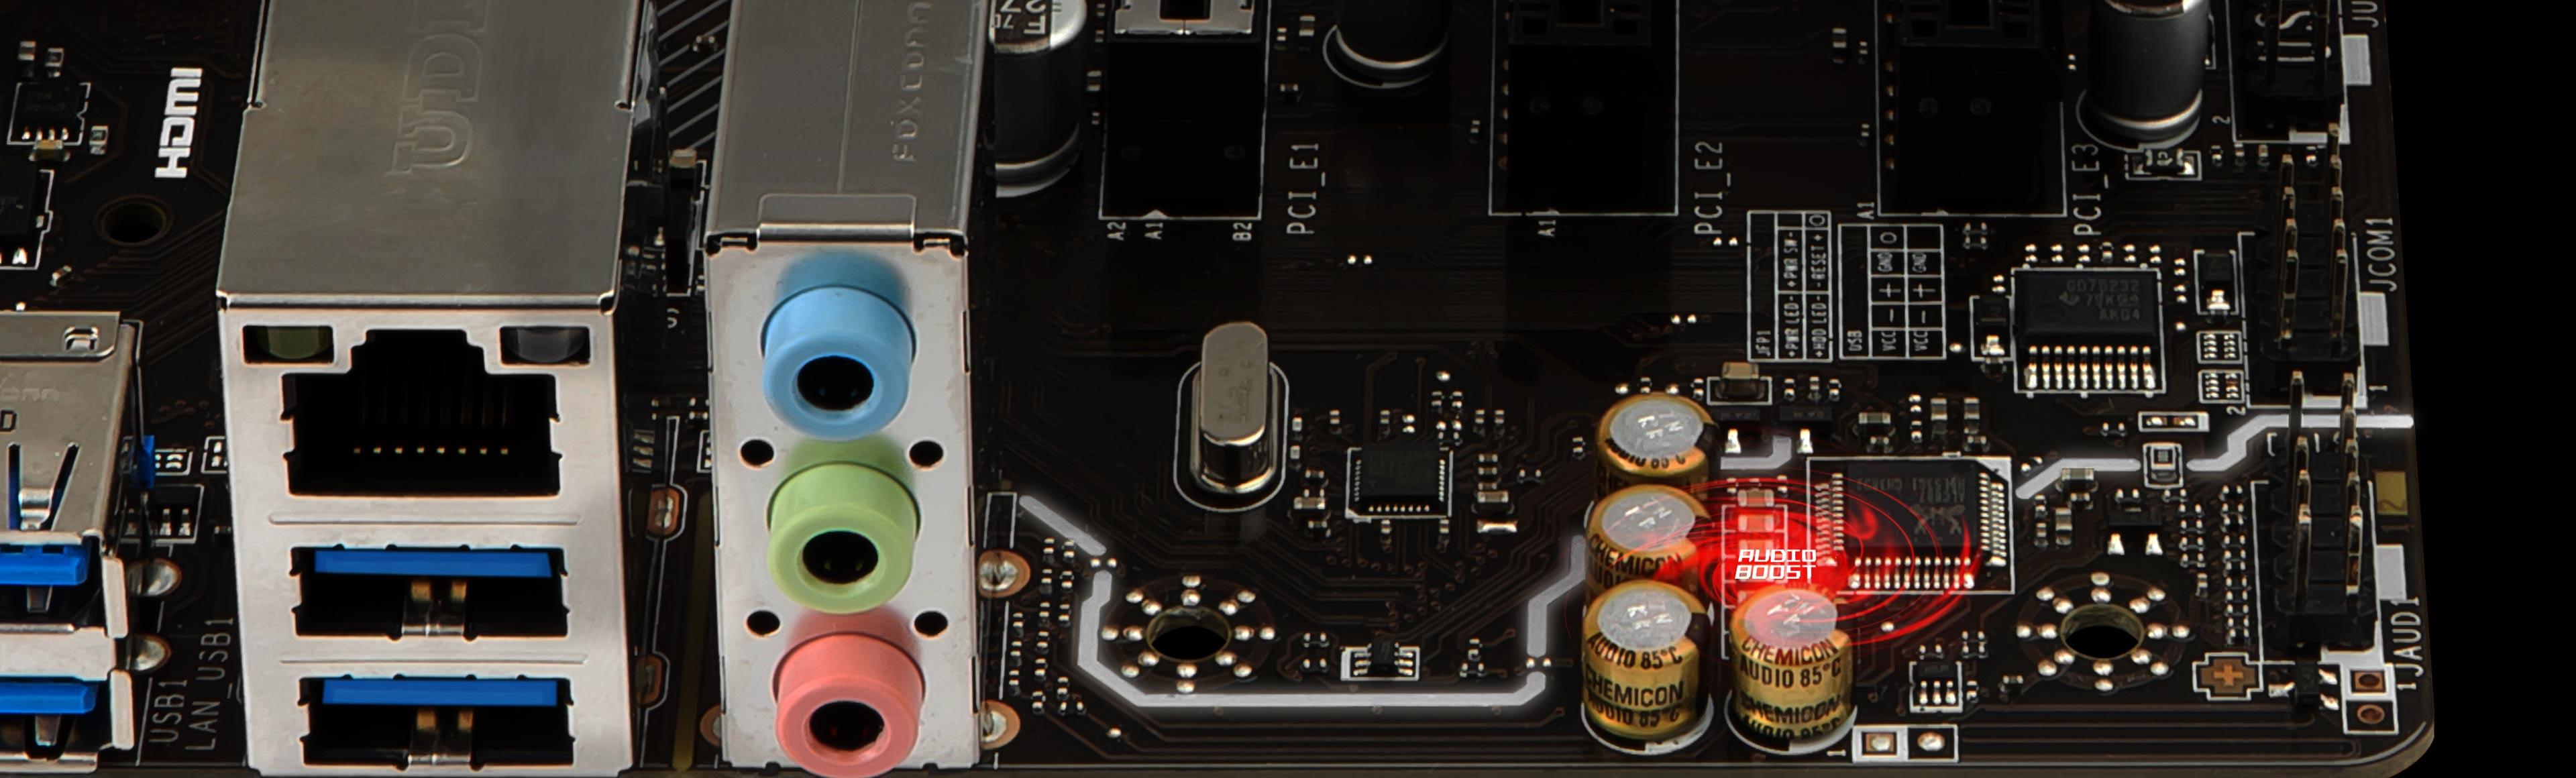 FOXCONN 915GL7MH-S ADI AUDIO WINDOWS 7 X64 TREIBER